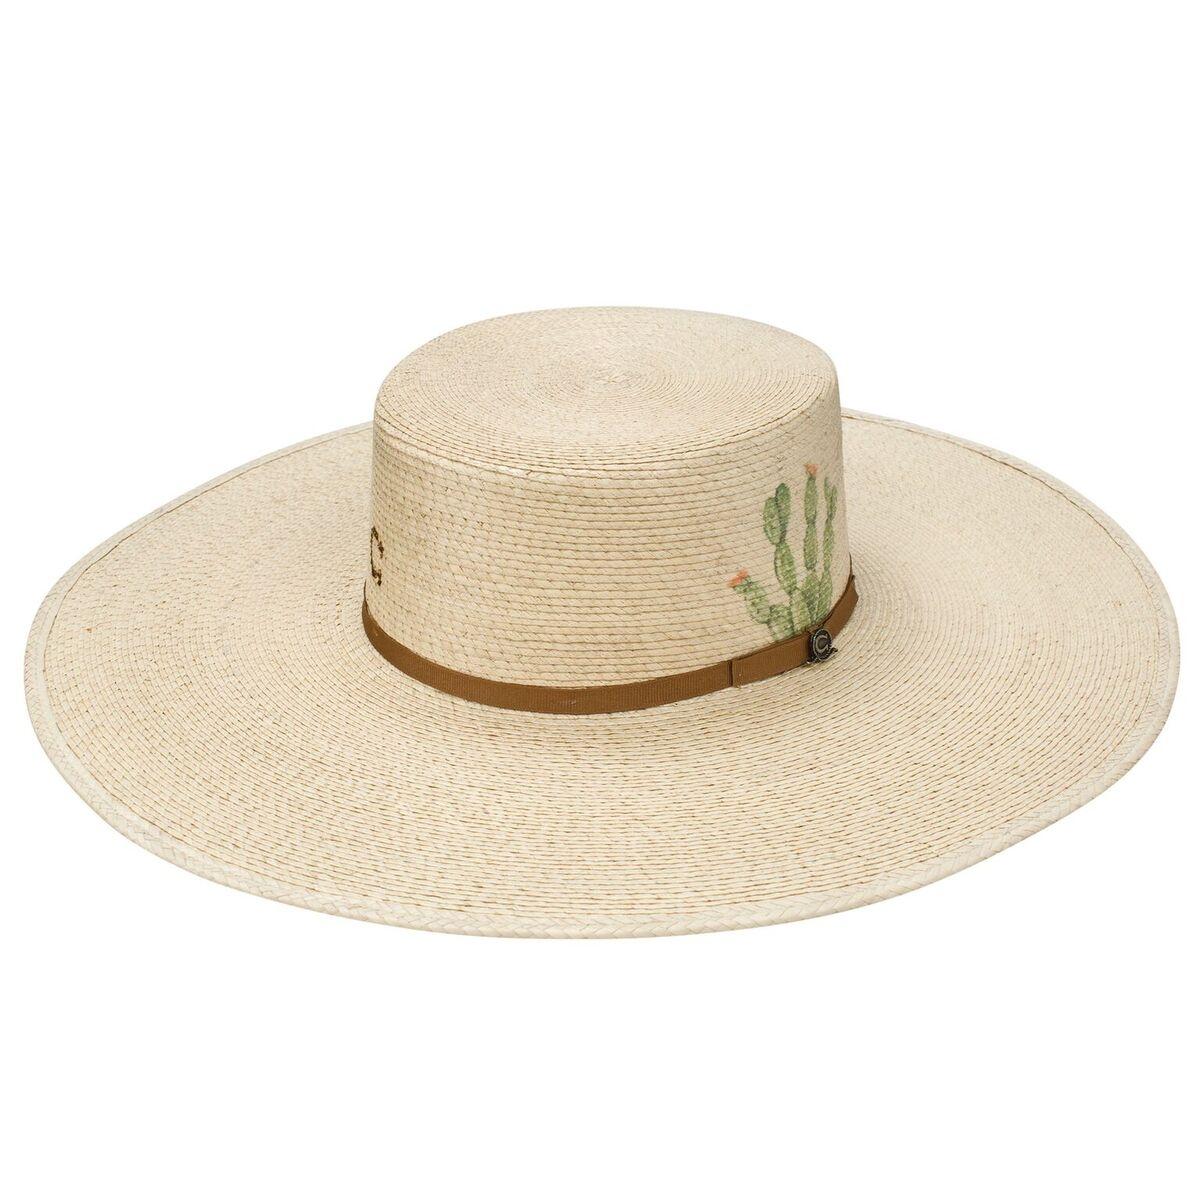 Charlie 1 Horse Cactus Expert - Straw Cowboy Hat